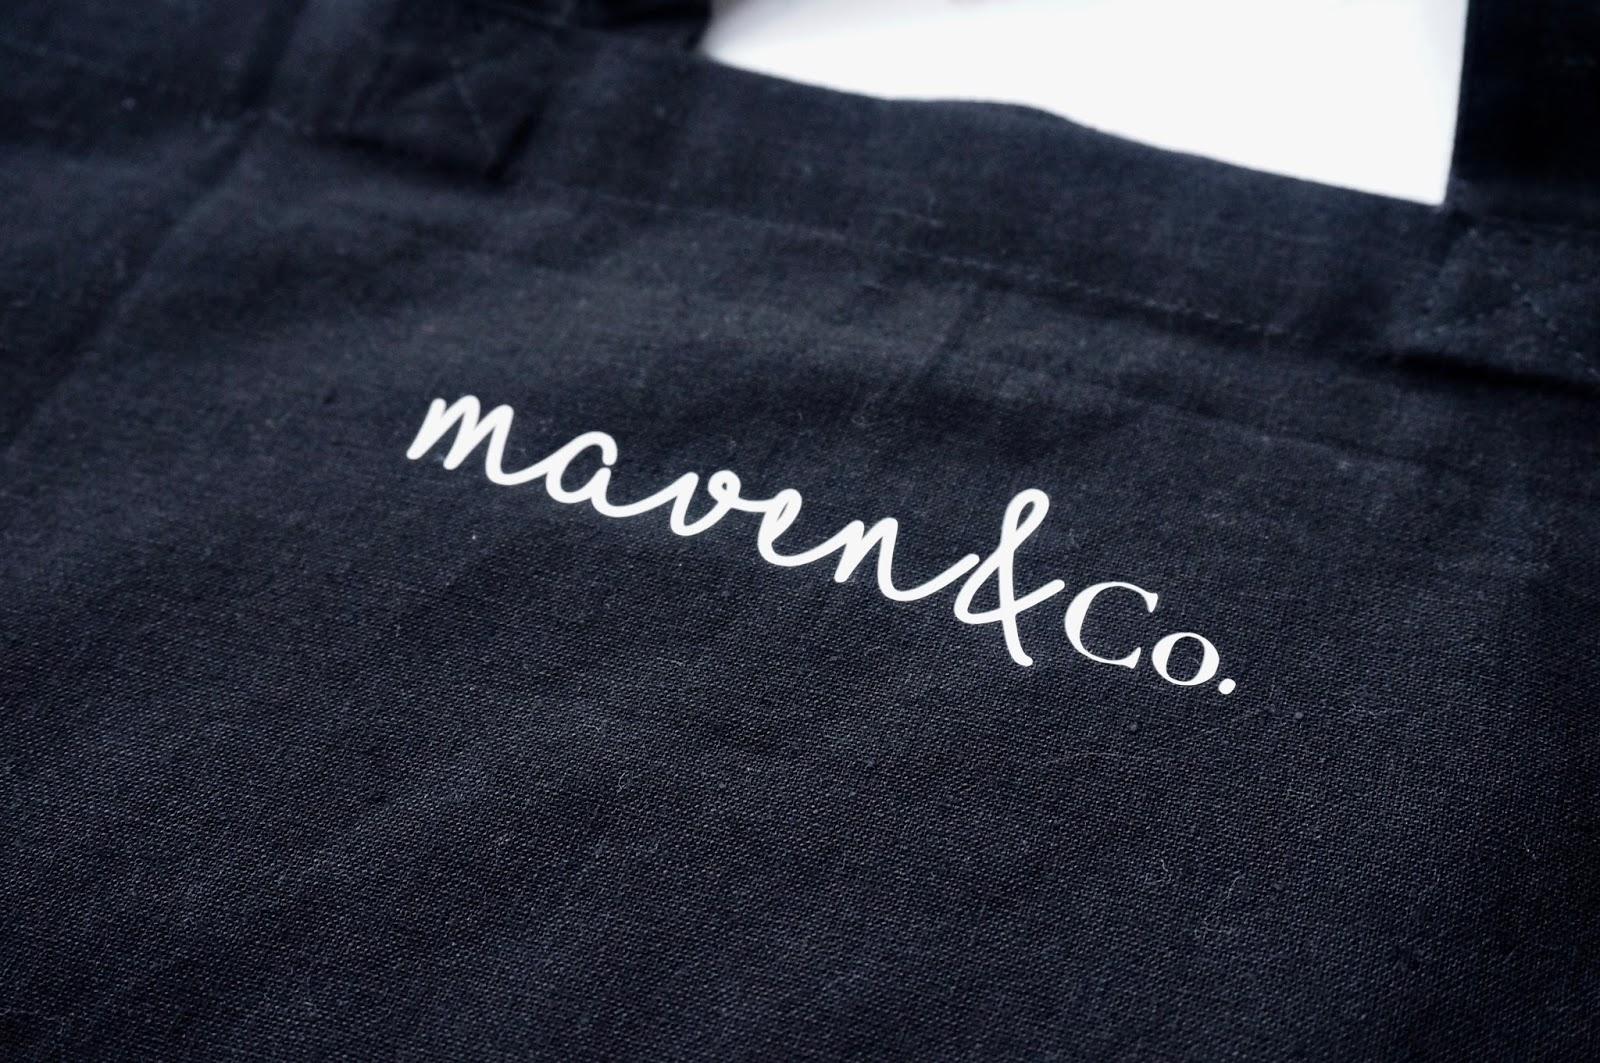 Maven & Co Tote Bags